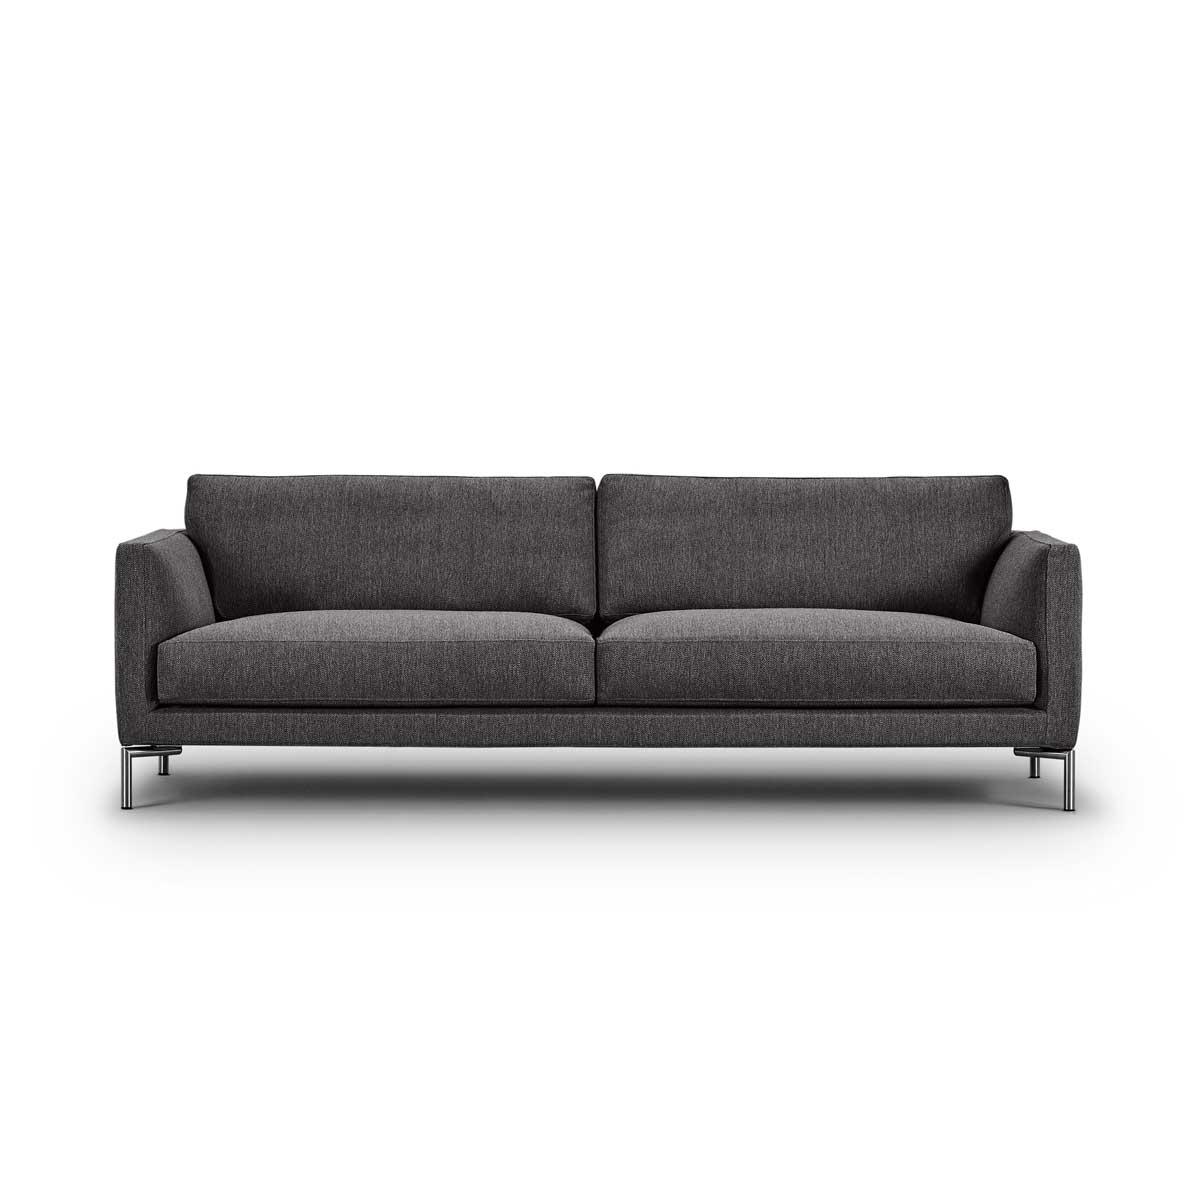 Mission-sofa-240x90-cm-Gravel-16-1-374520